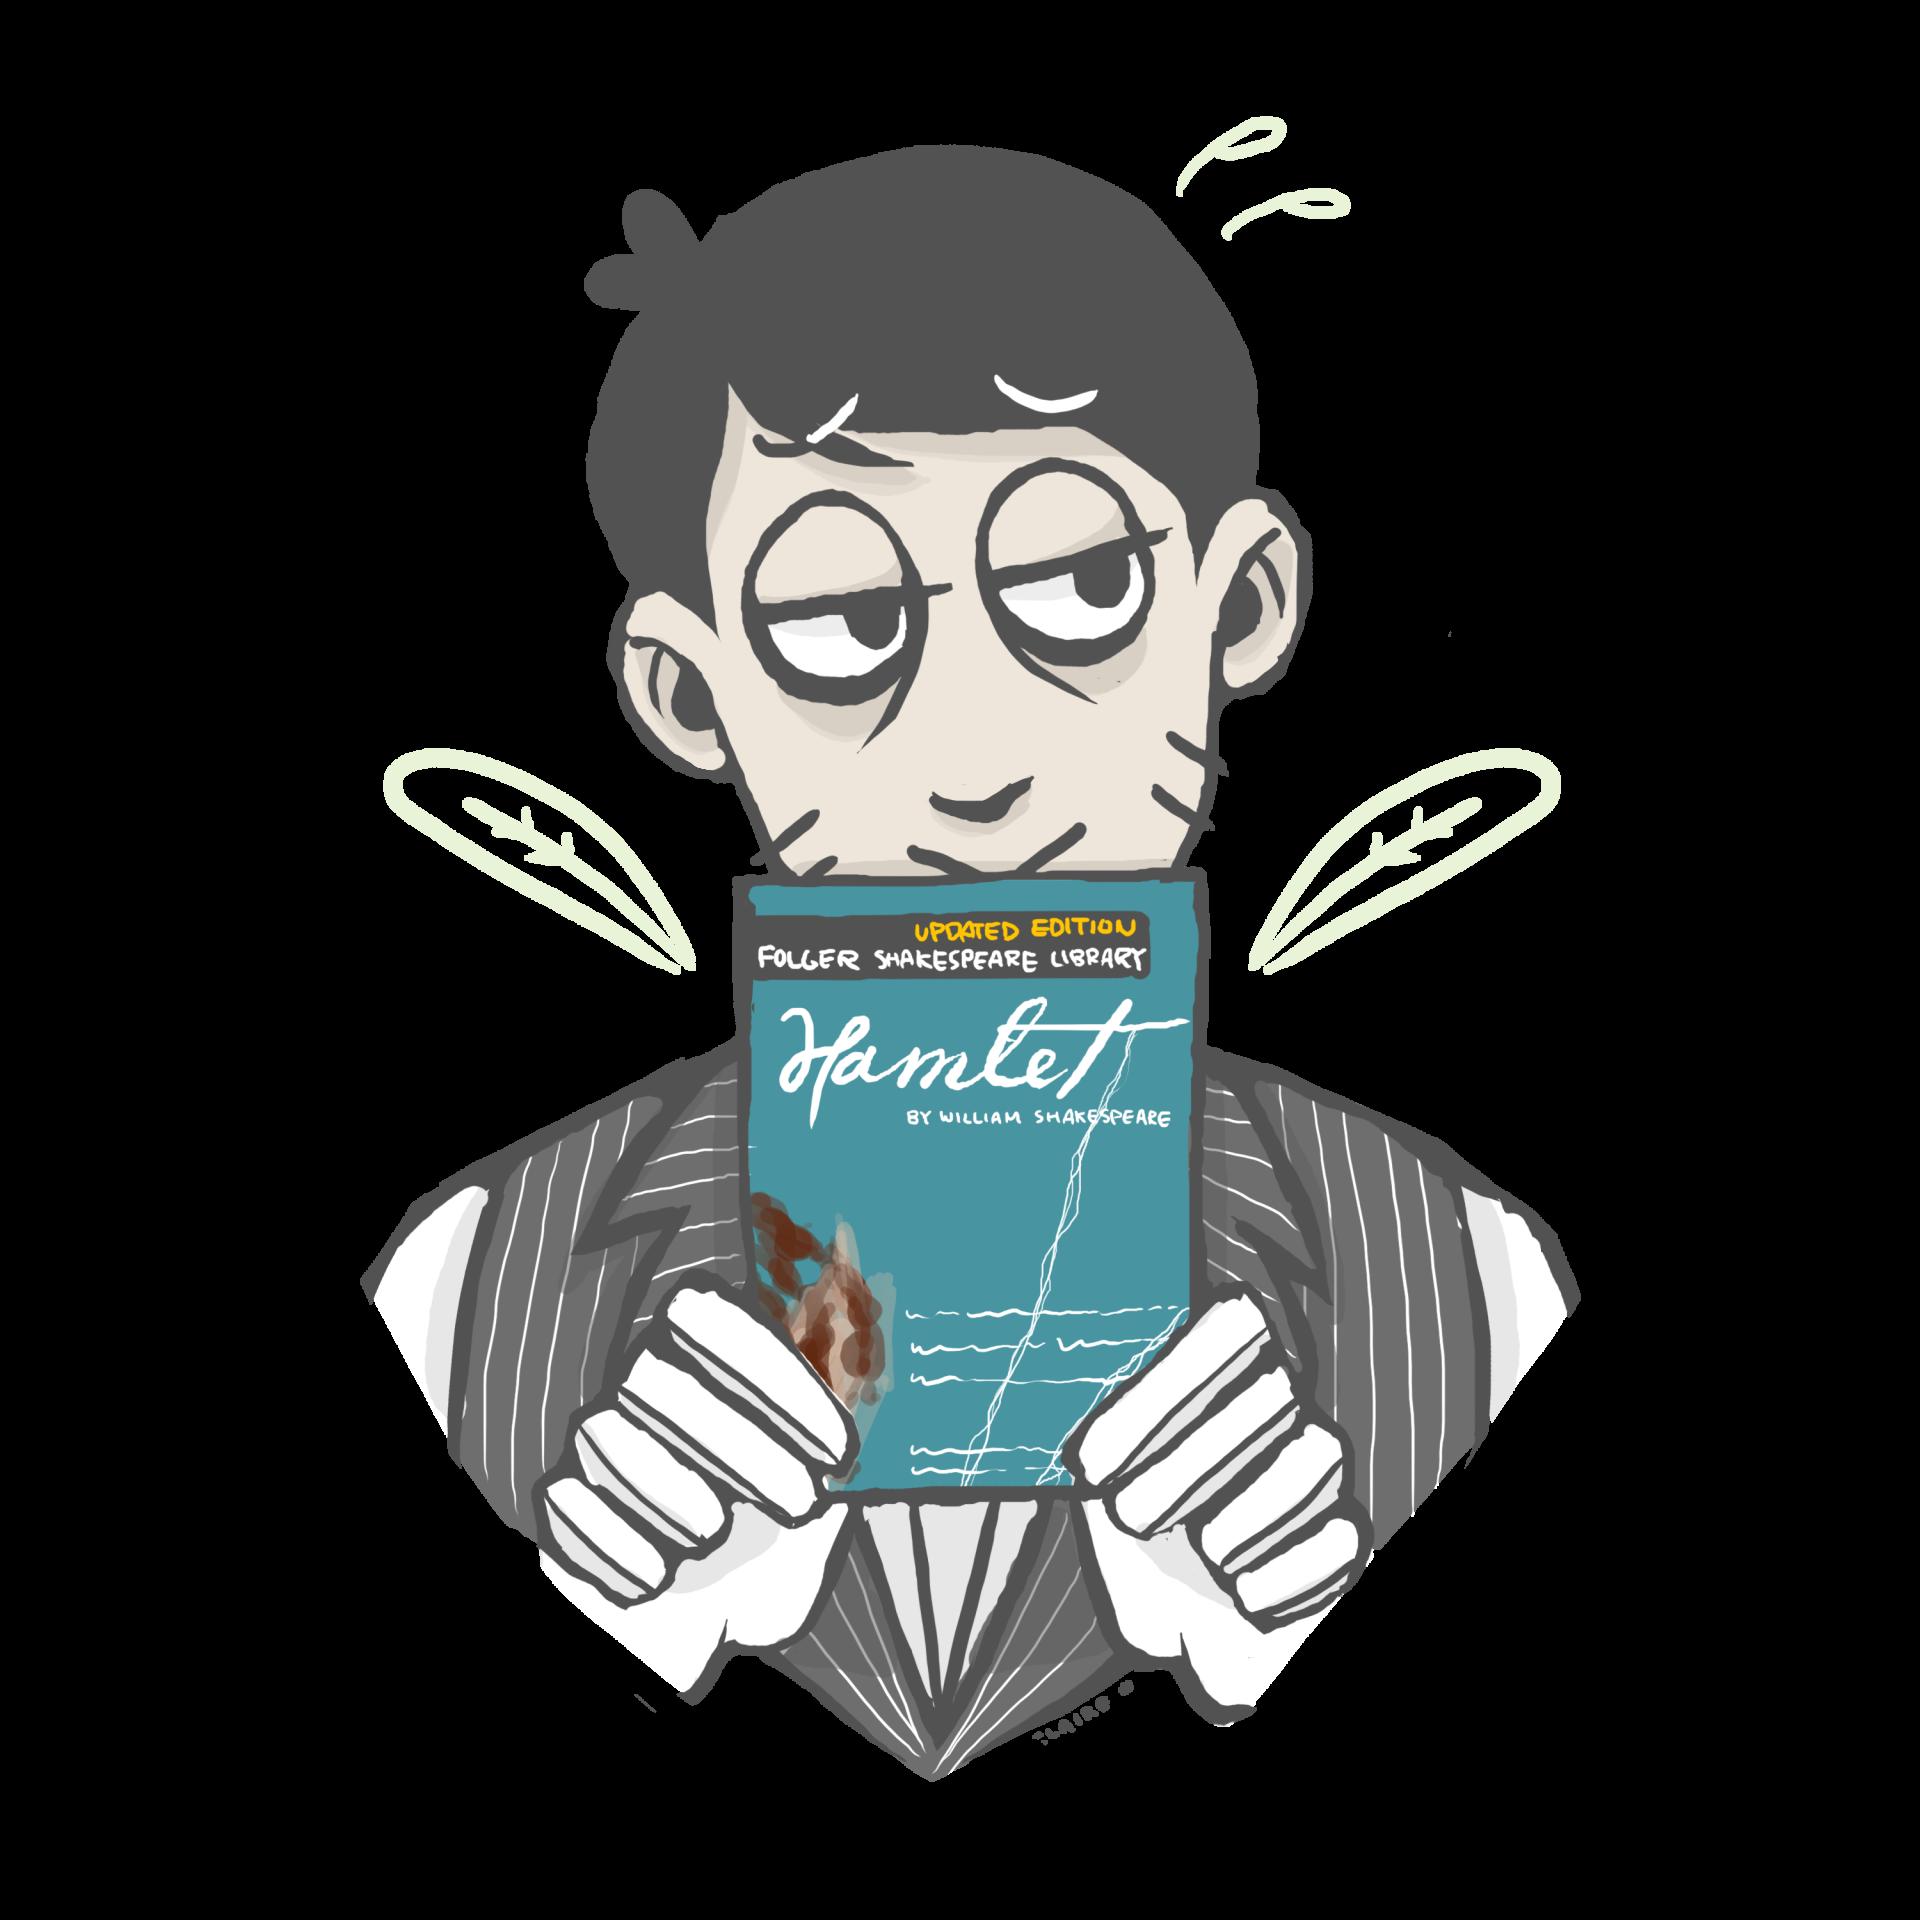 1920x1920 Hamlet Drawing Free Download On Unixtitan